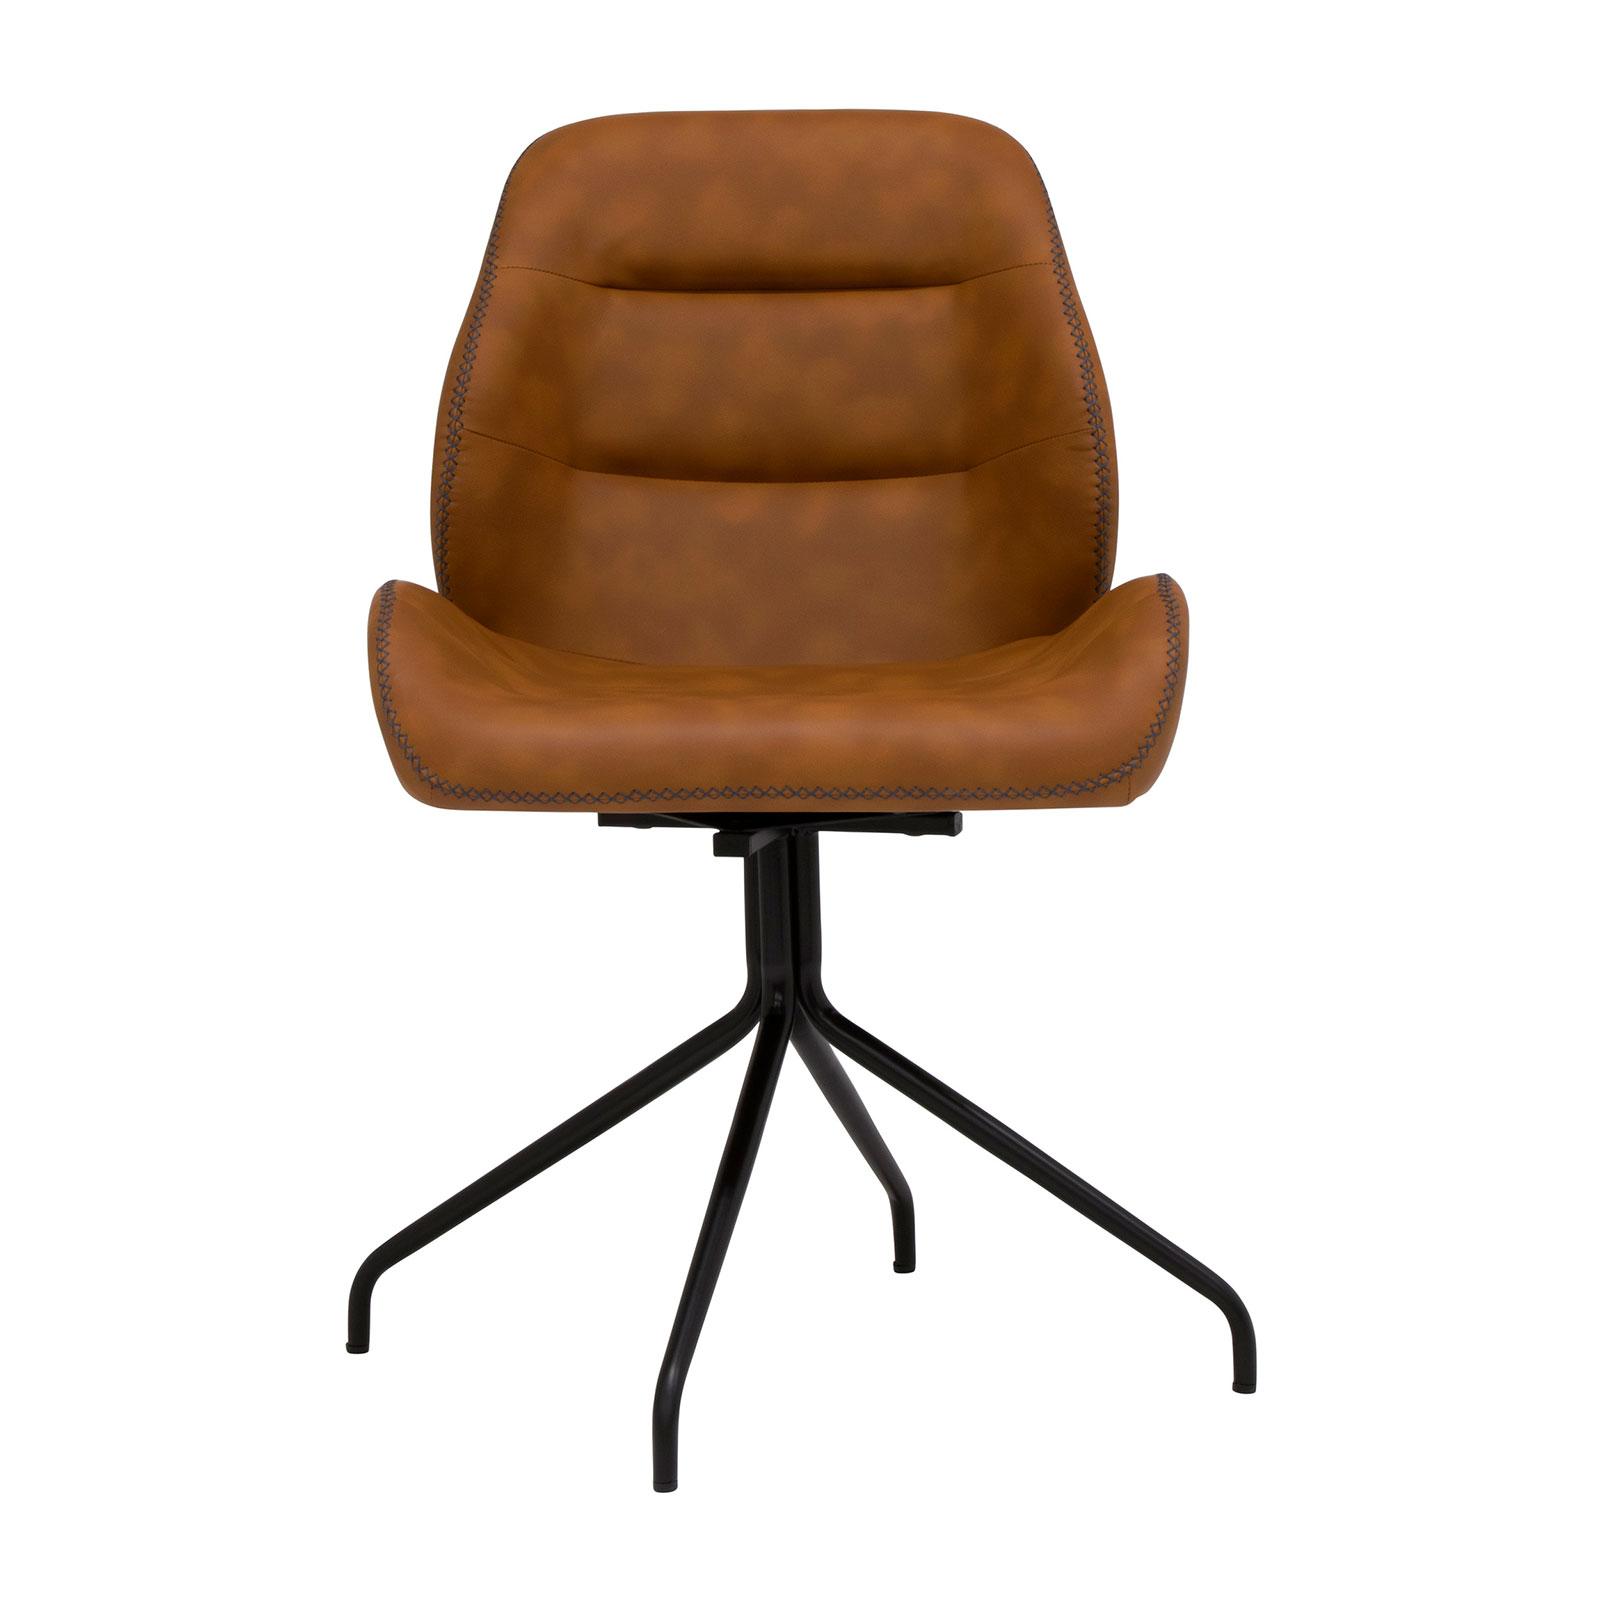 52001-Devonport-Office-Chair-front